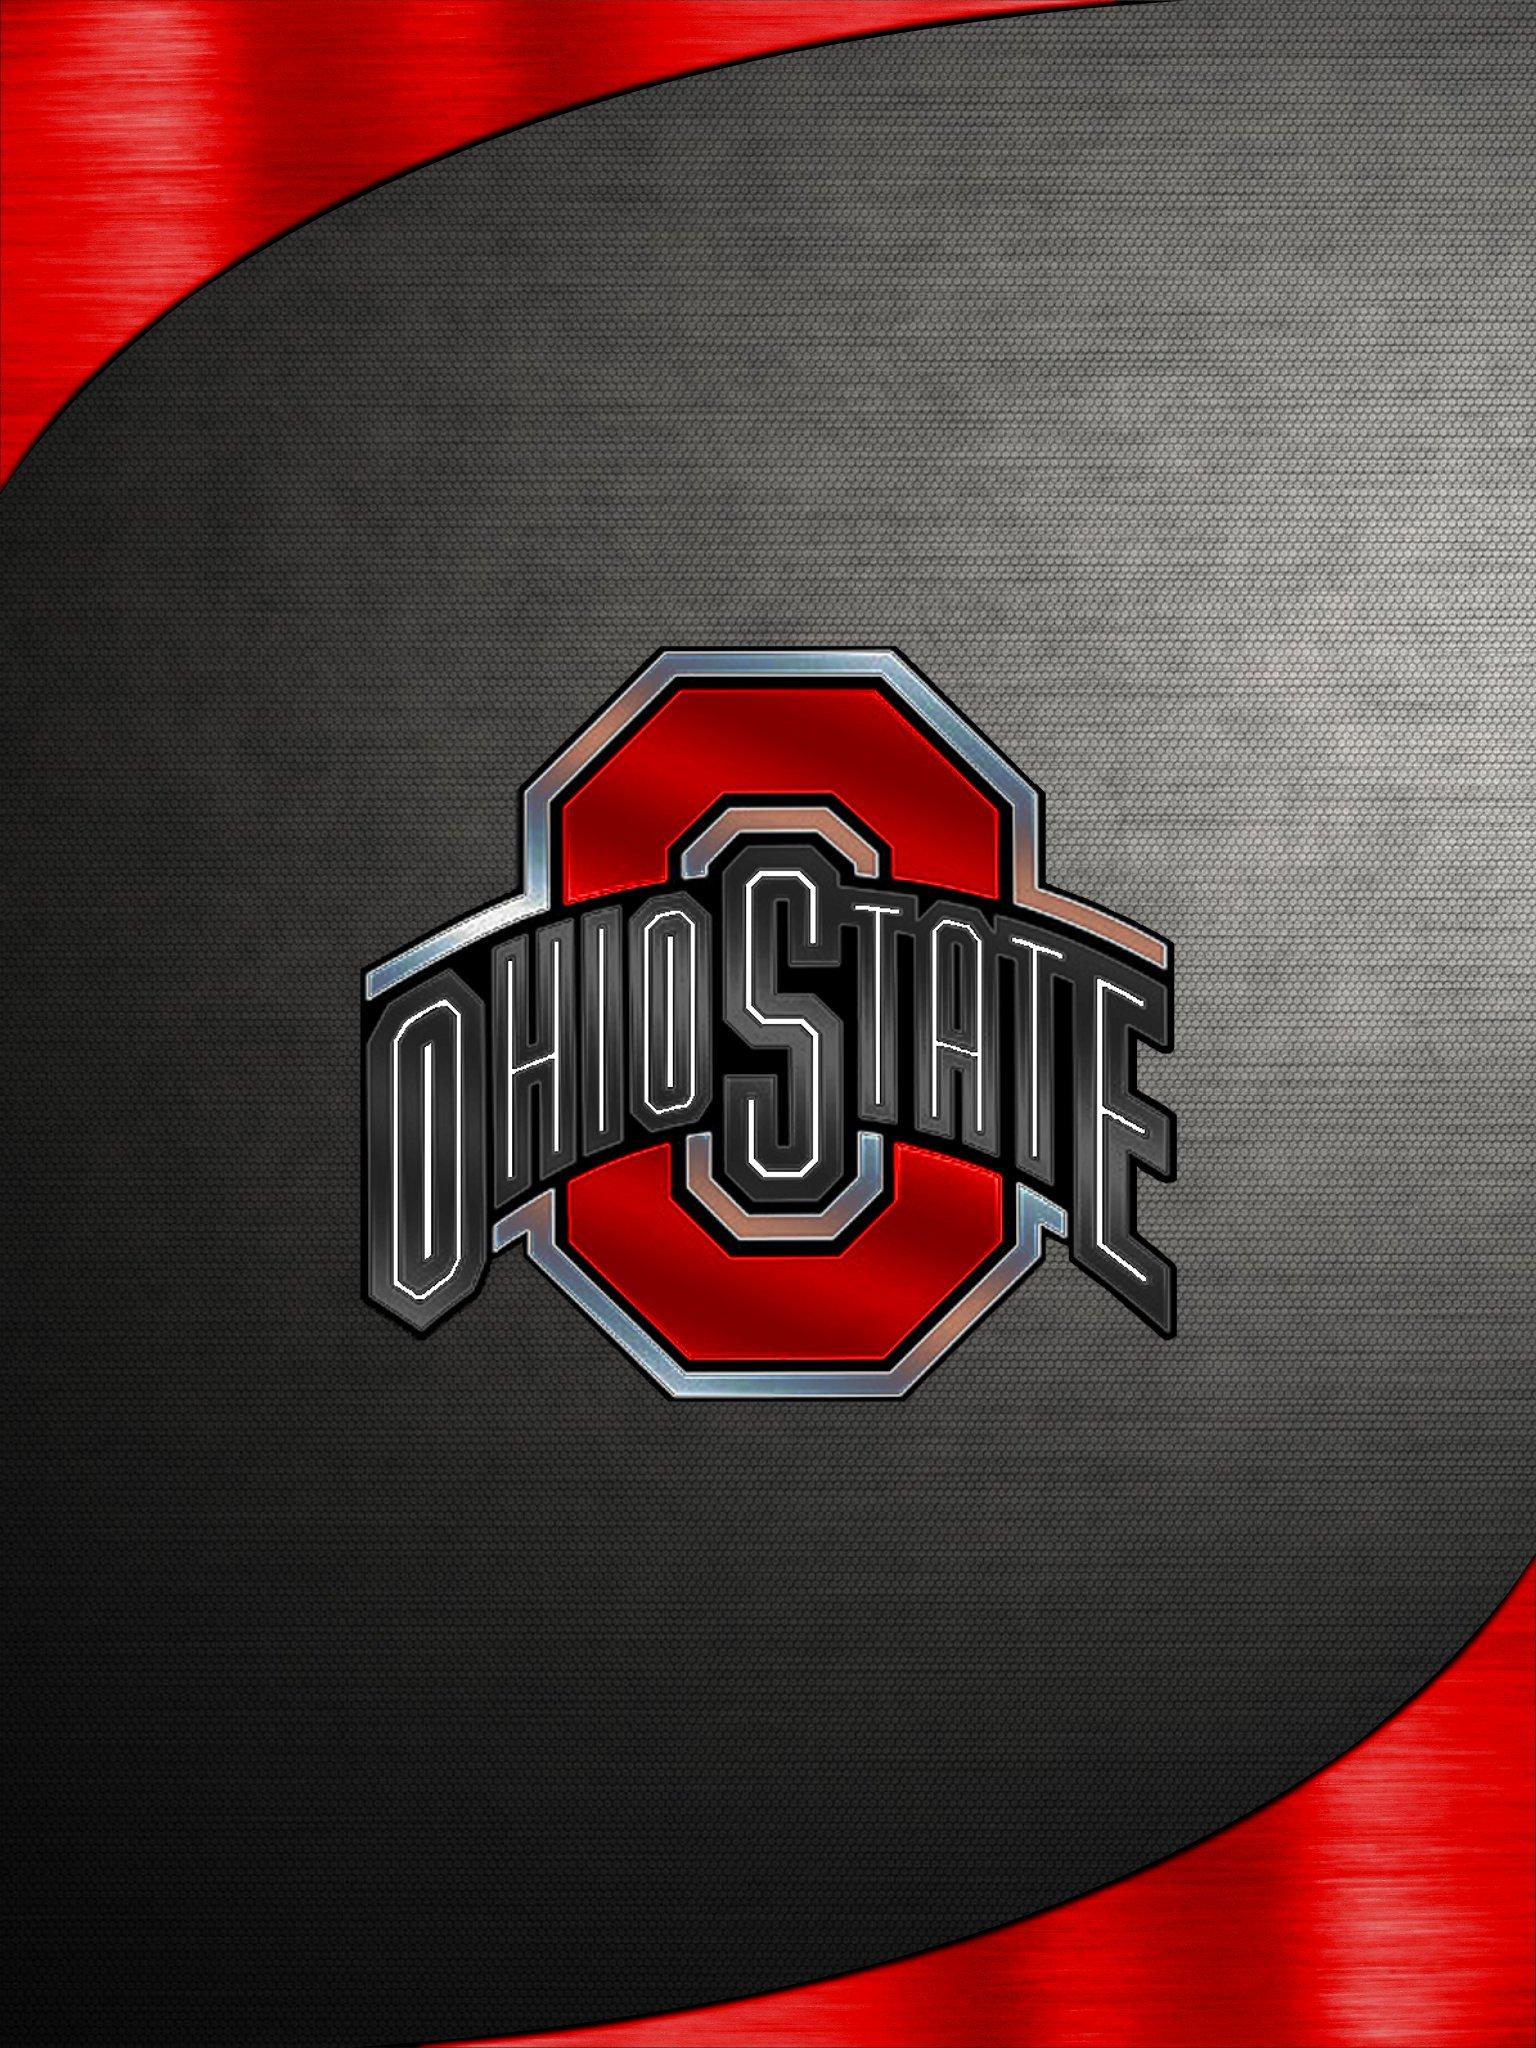 Ohio State Football OSU ipad 2 Wallpaper 41